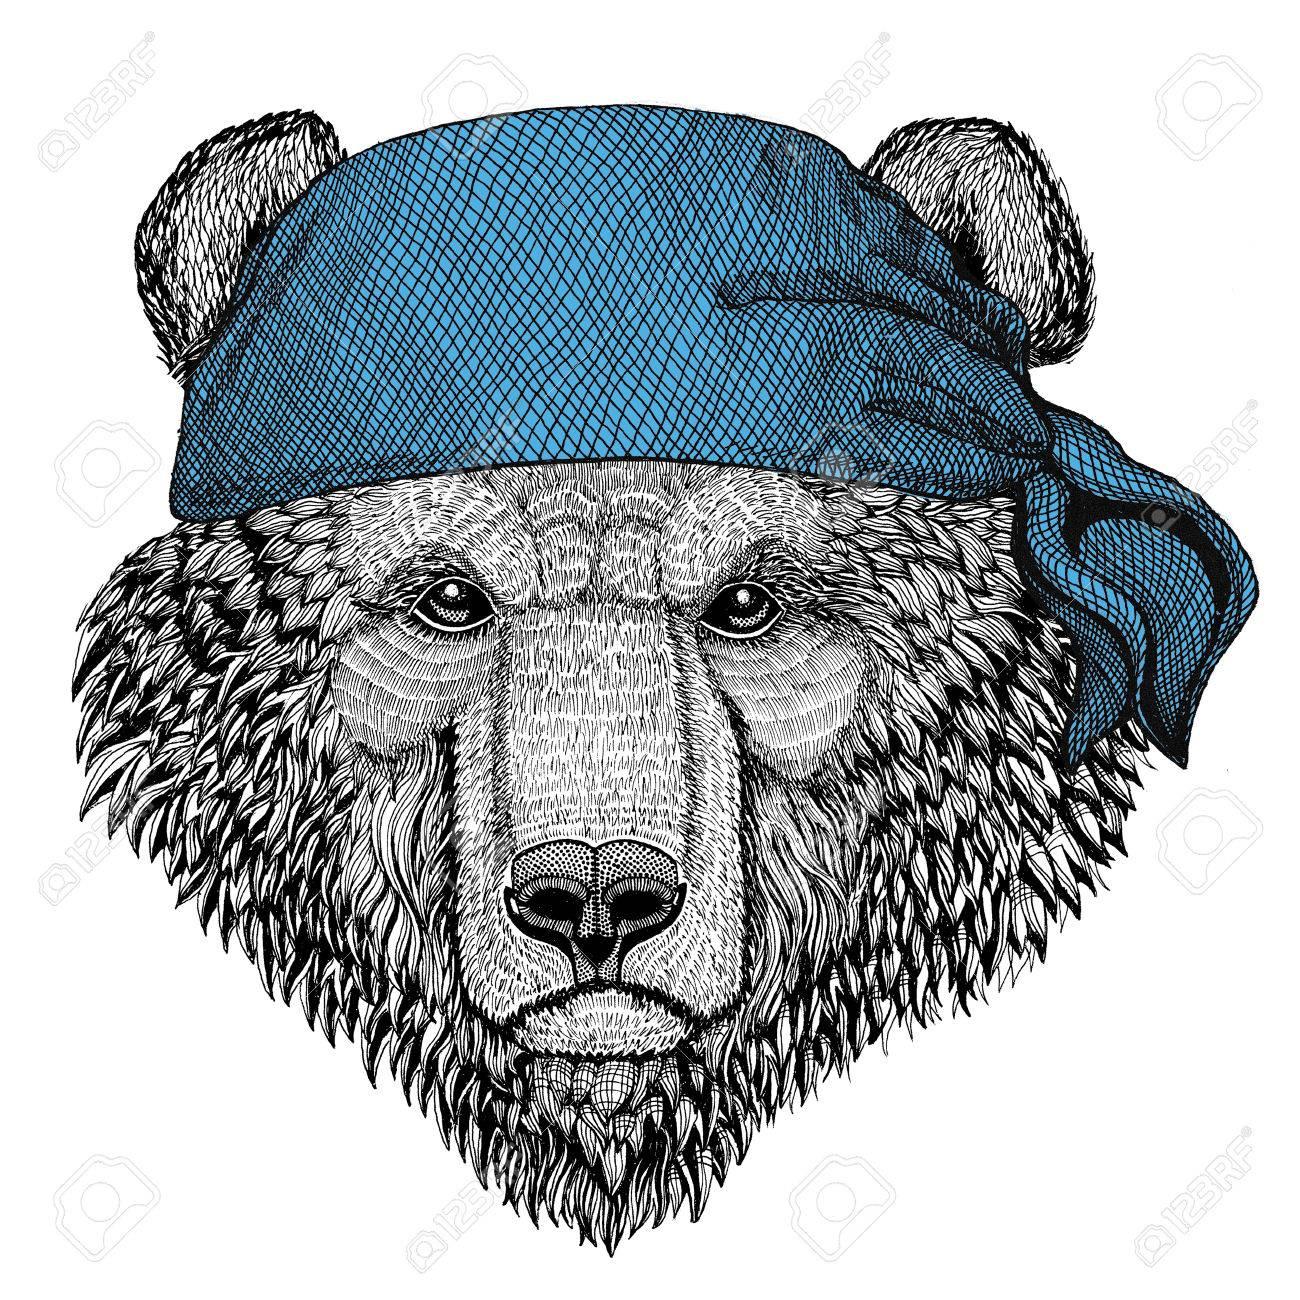 Braunbar Russischer Bar Wildtier Tragen Bandana Oder Tuch Oder